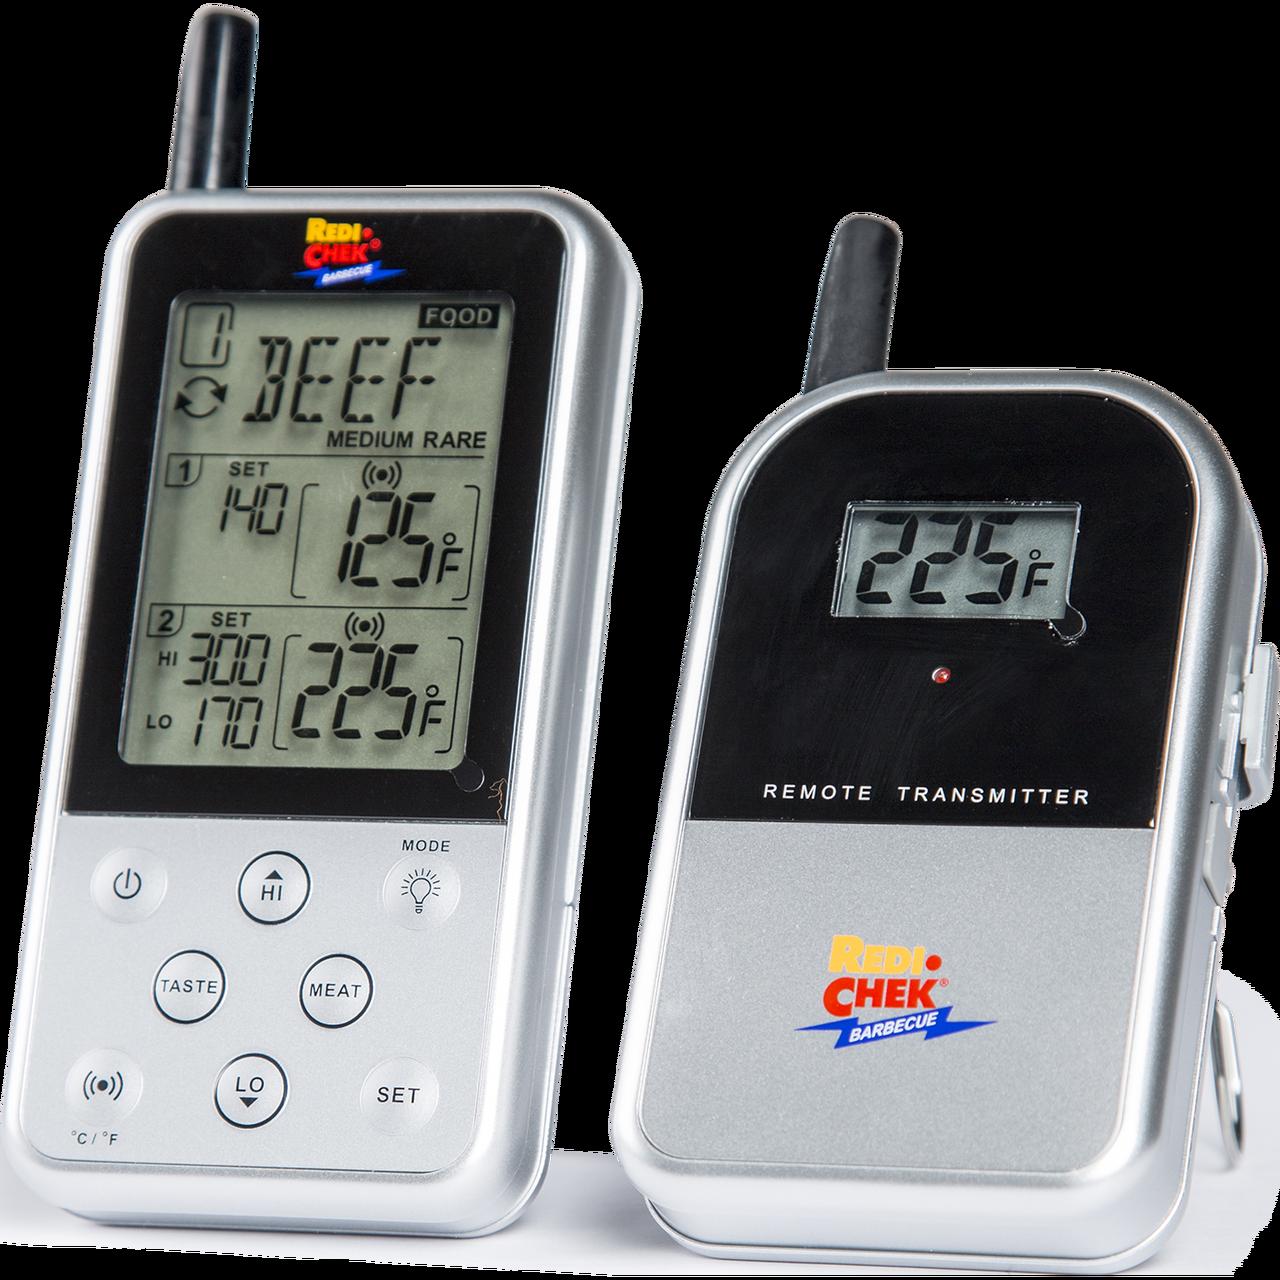 Maverick Wireless Grill Thermometer Wire Center 15vdualpowersupplycircuitdiagramgif Et 733 Bbq Rh Pkgrills Com 732 B Barbecue